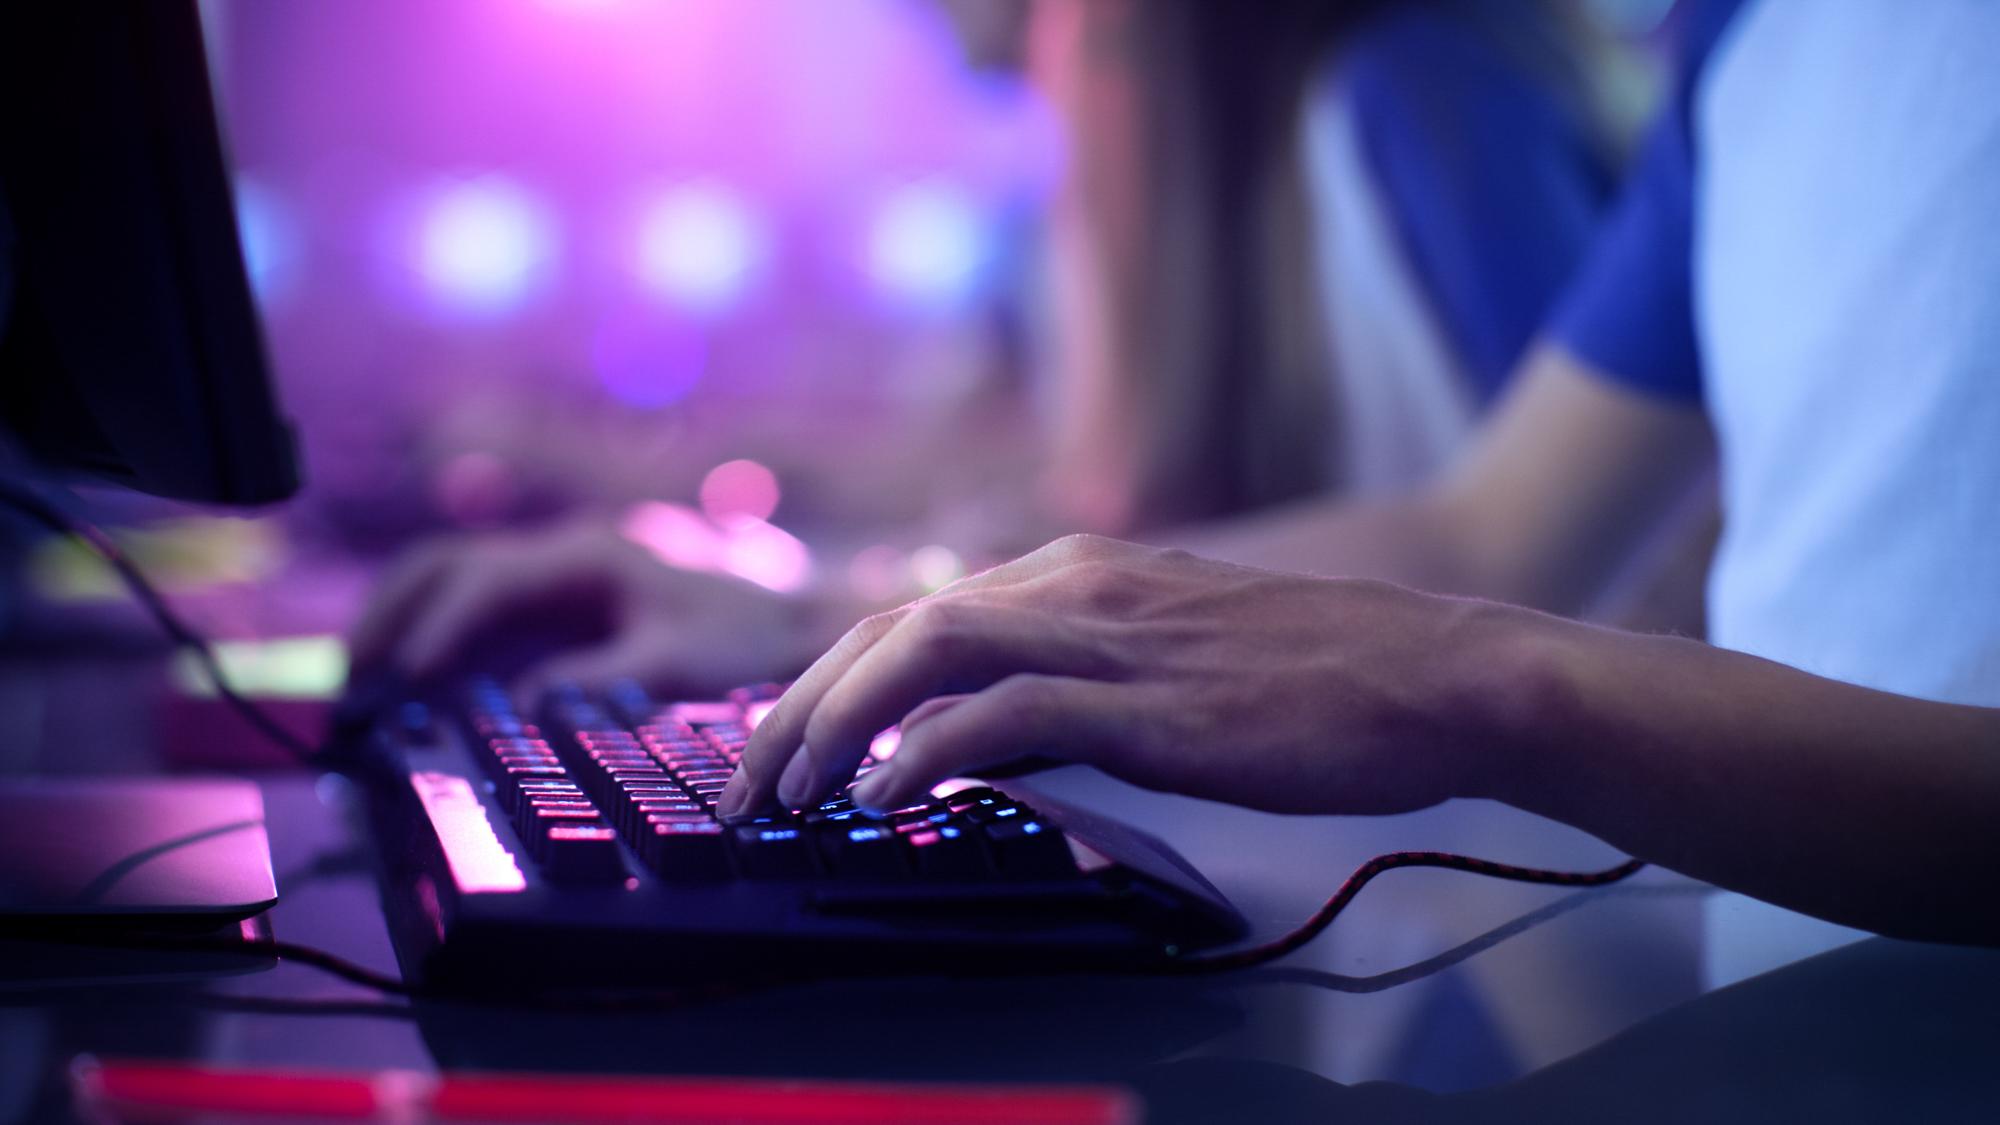 Elev på Toppirdett med E-sport, hånd på tastatur. Foto.